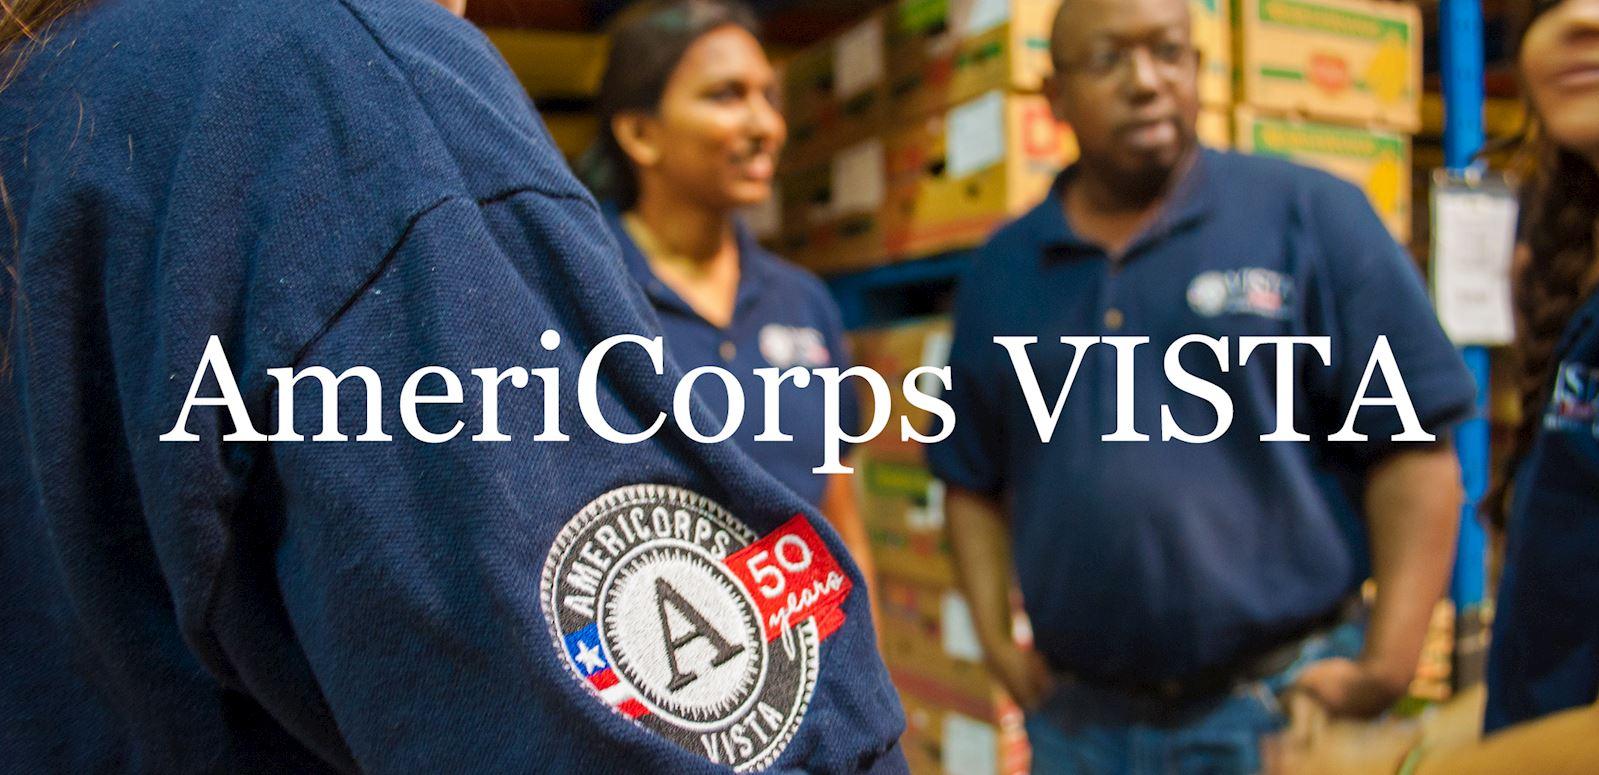 AmeriCorps VISTA